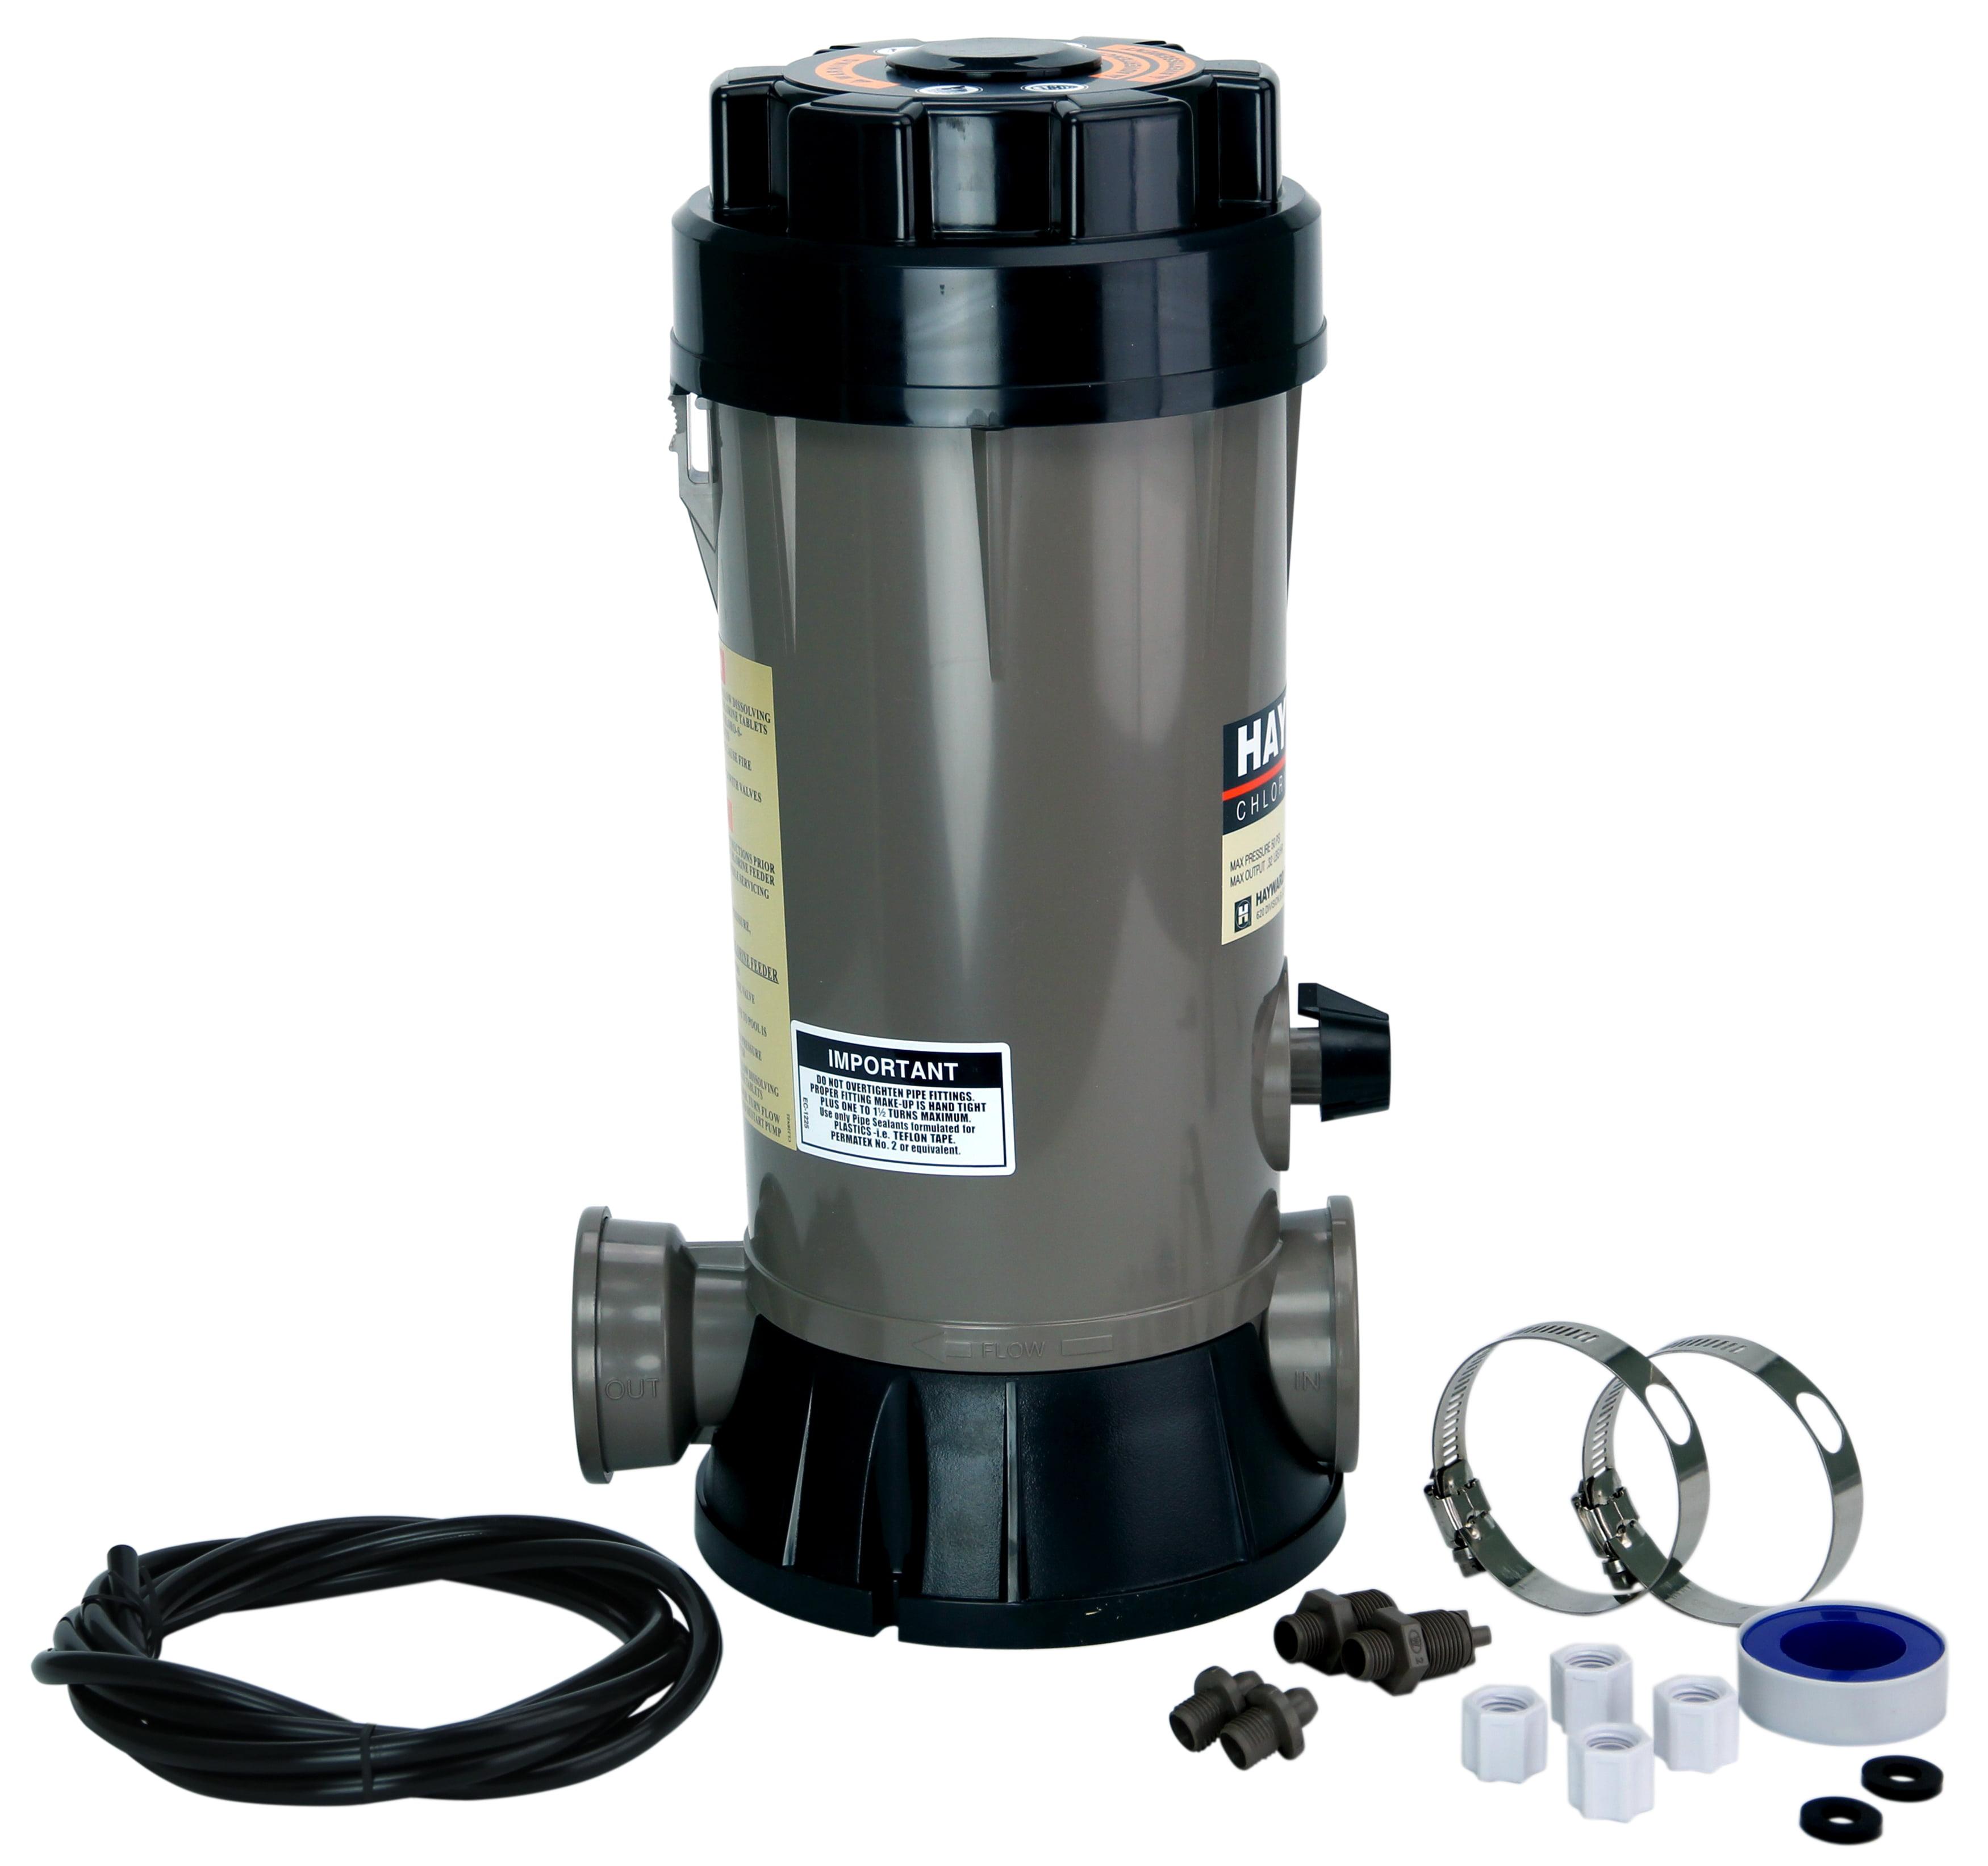 dispenser ip chlorine large feeder blue wave pools canada en floating walmart automatic for